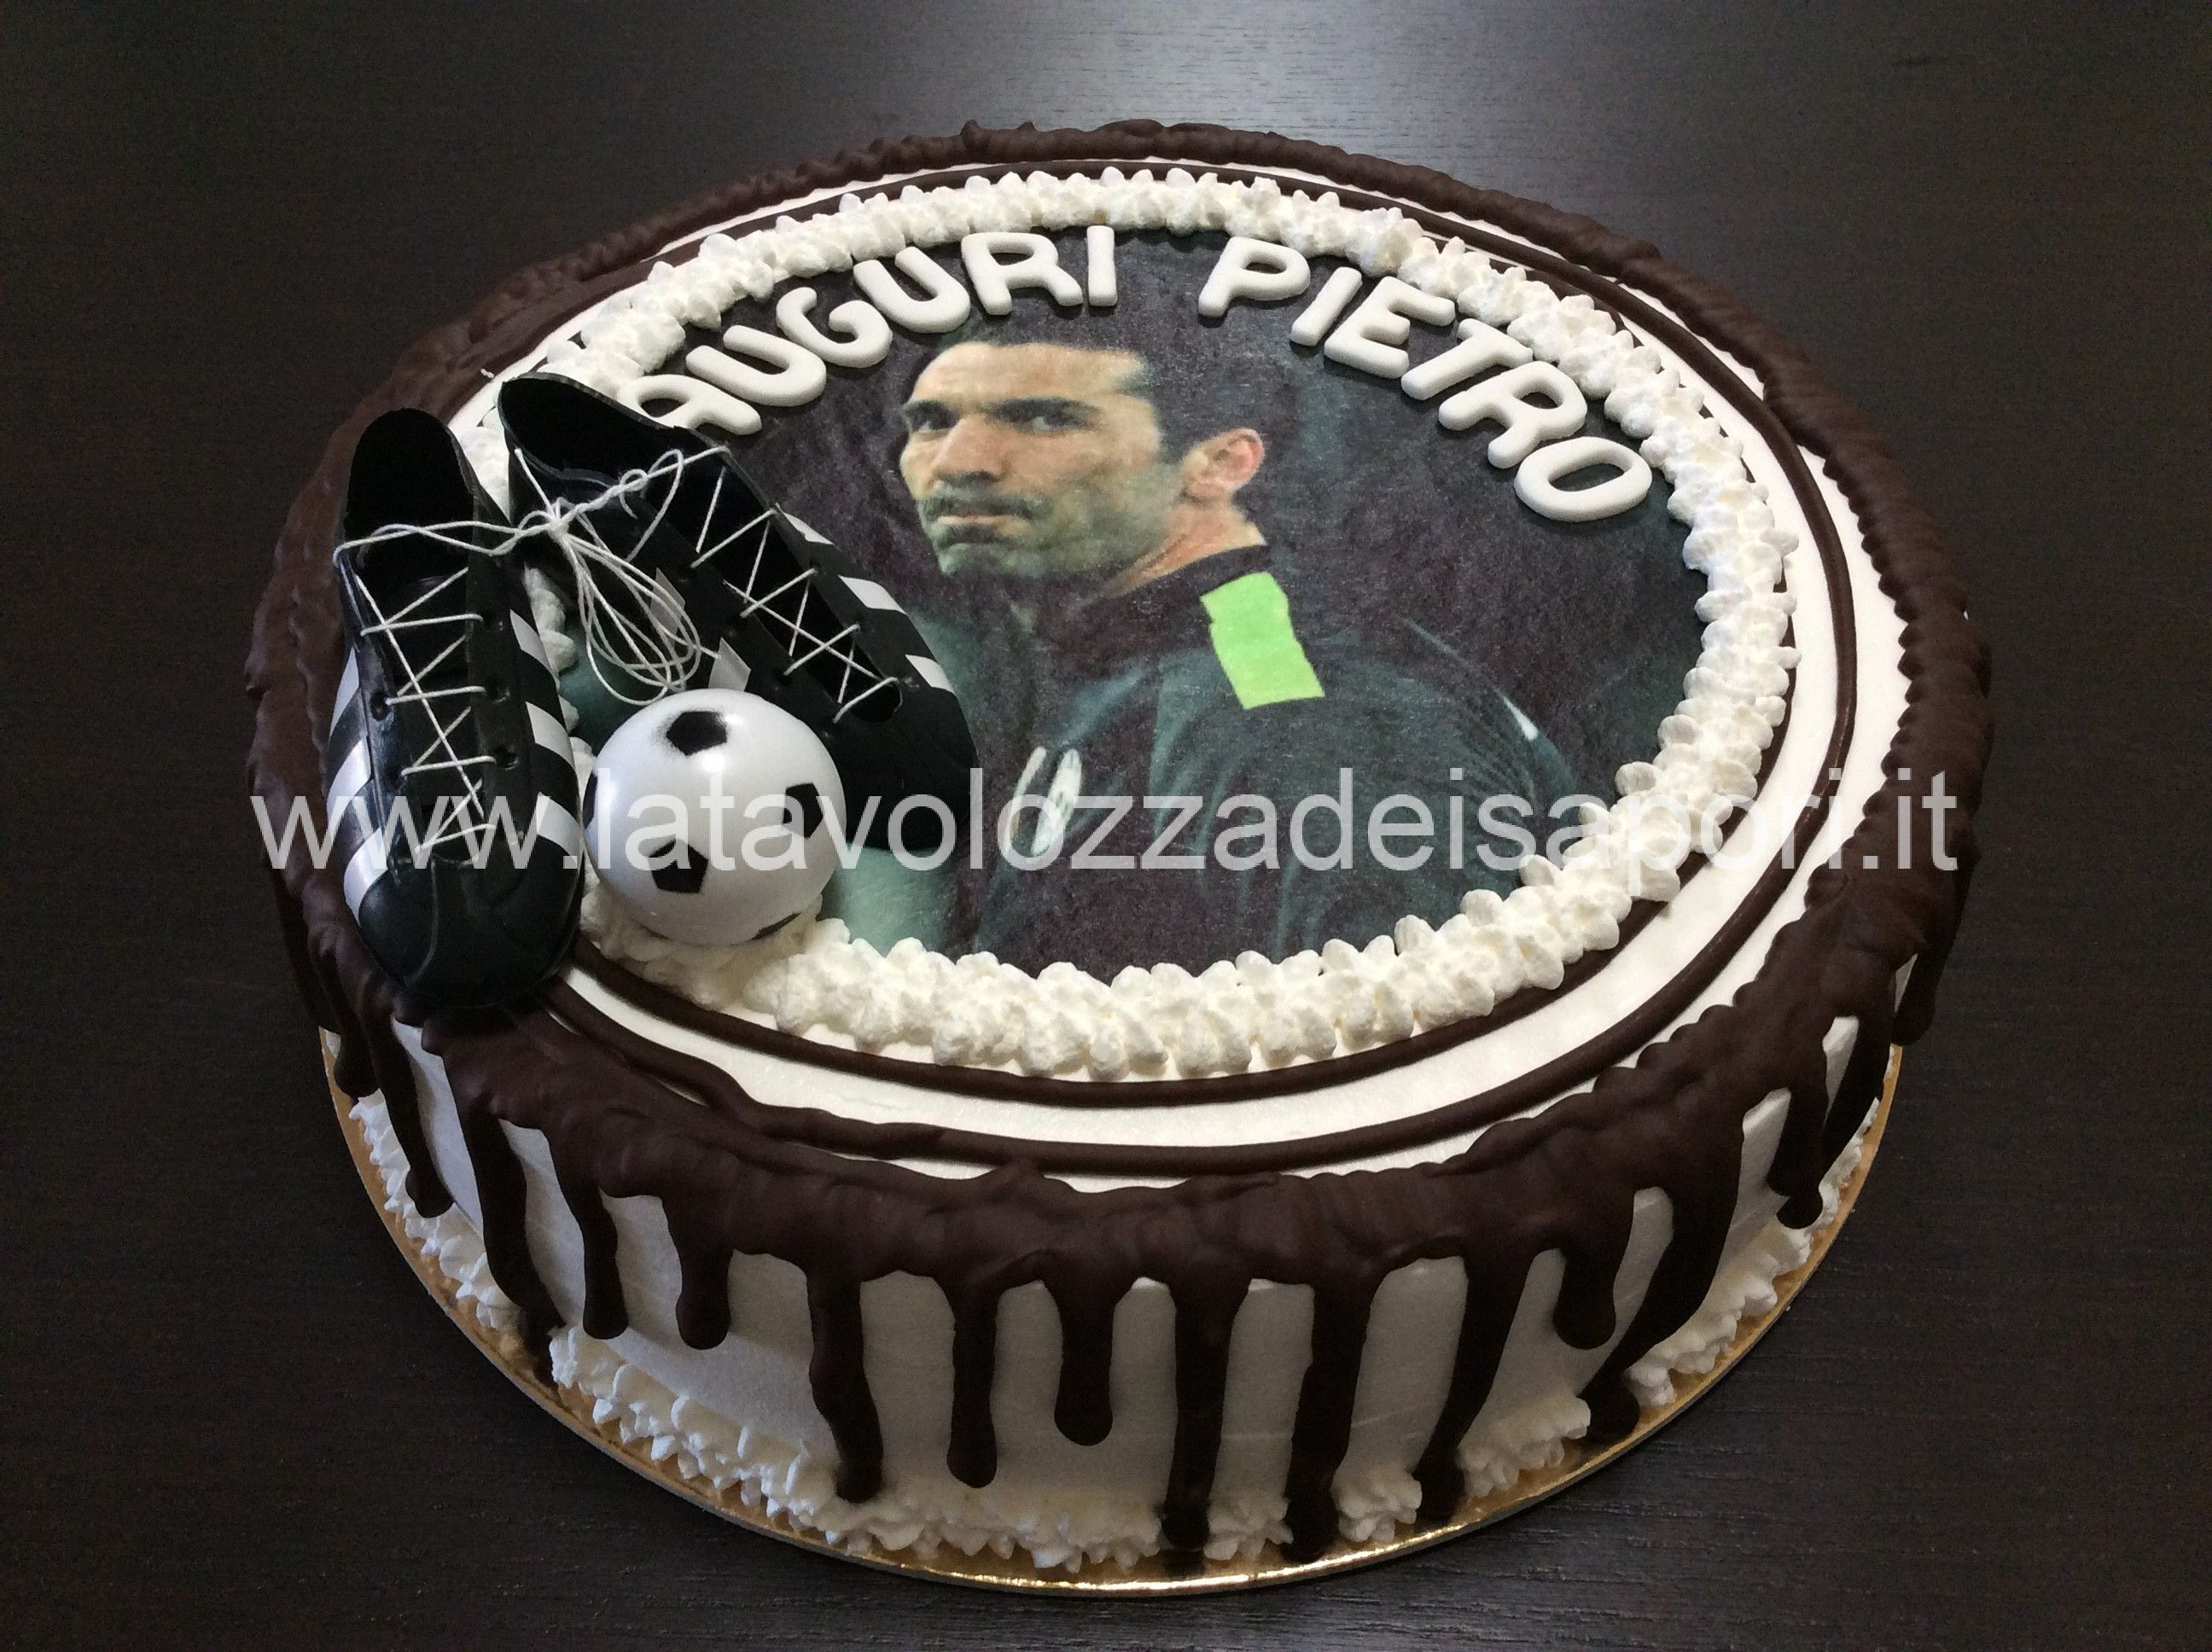 Torta Juventus con Cialda di Buffon httpwww